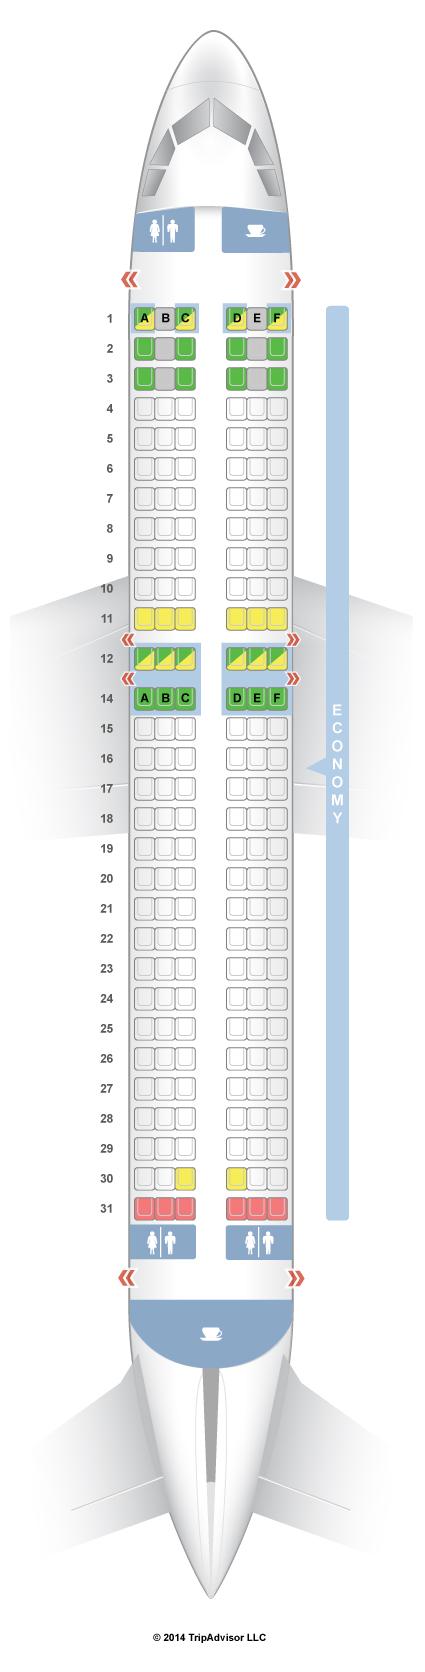 Love Seats Stoelen.Seatguru Seat Map Vueling Airlines Seatguru